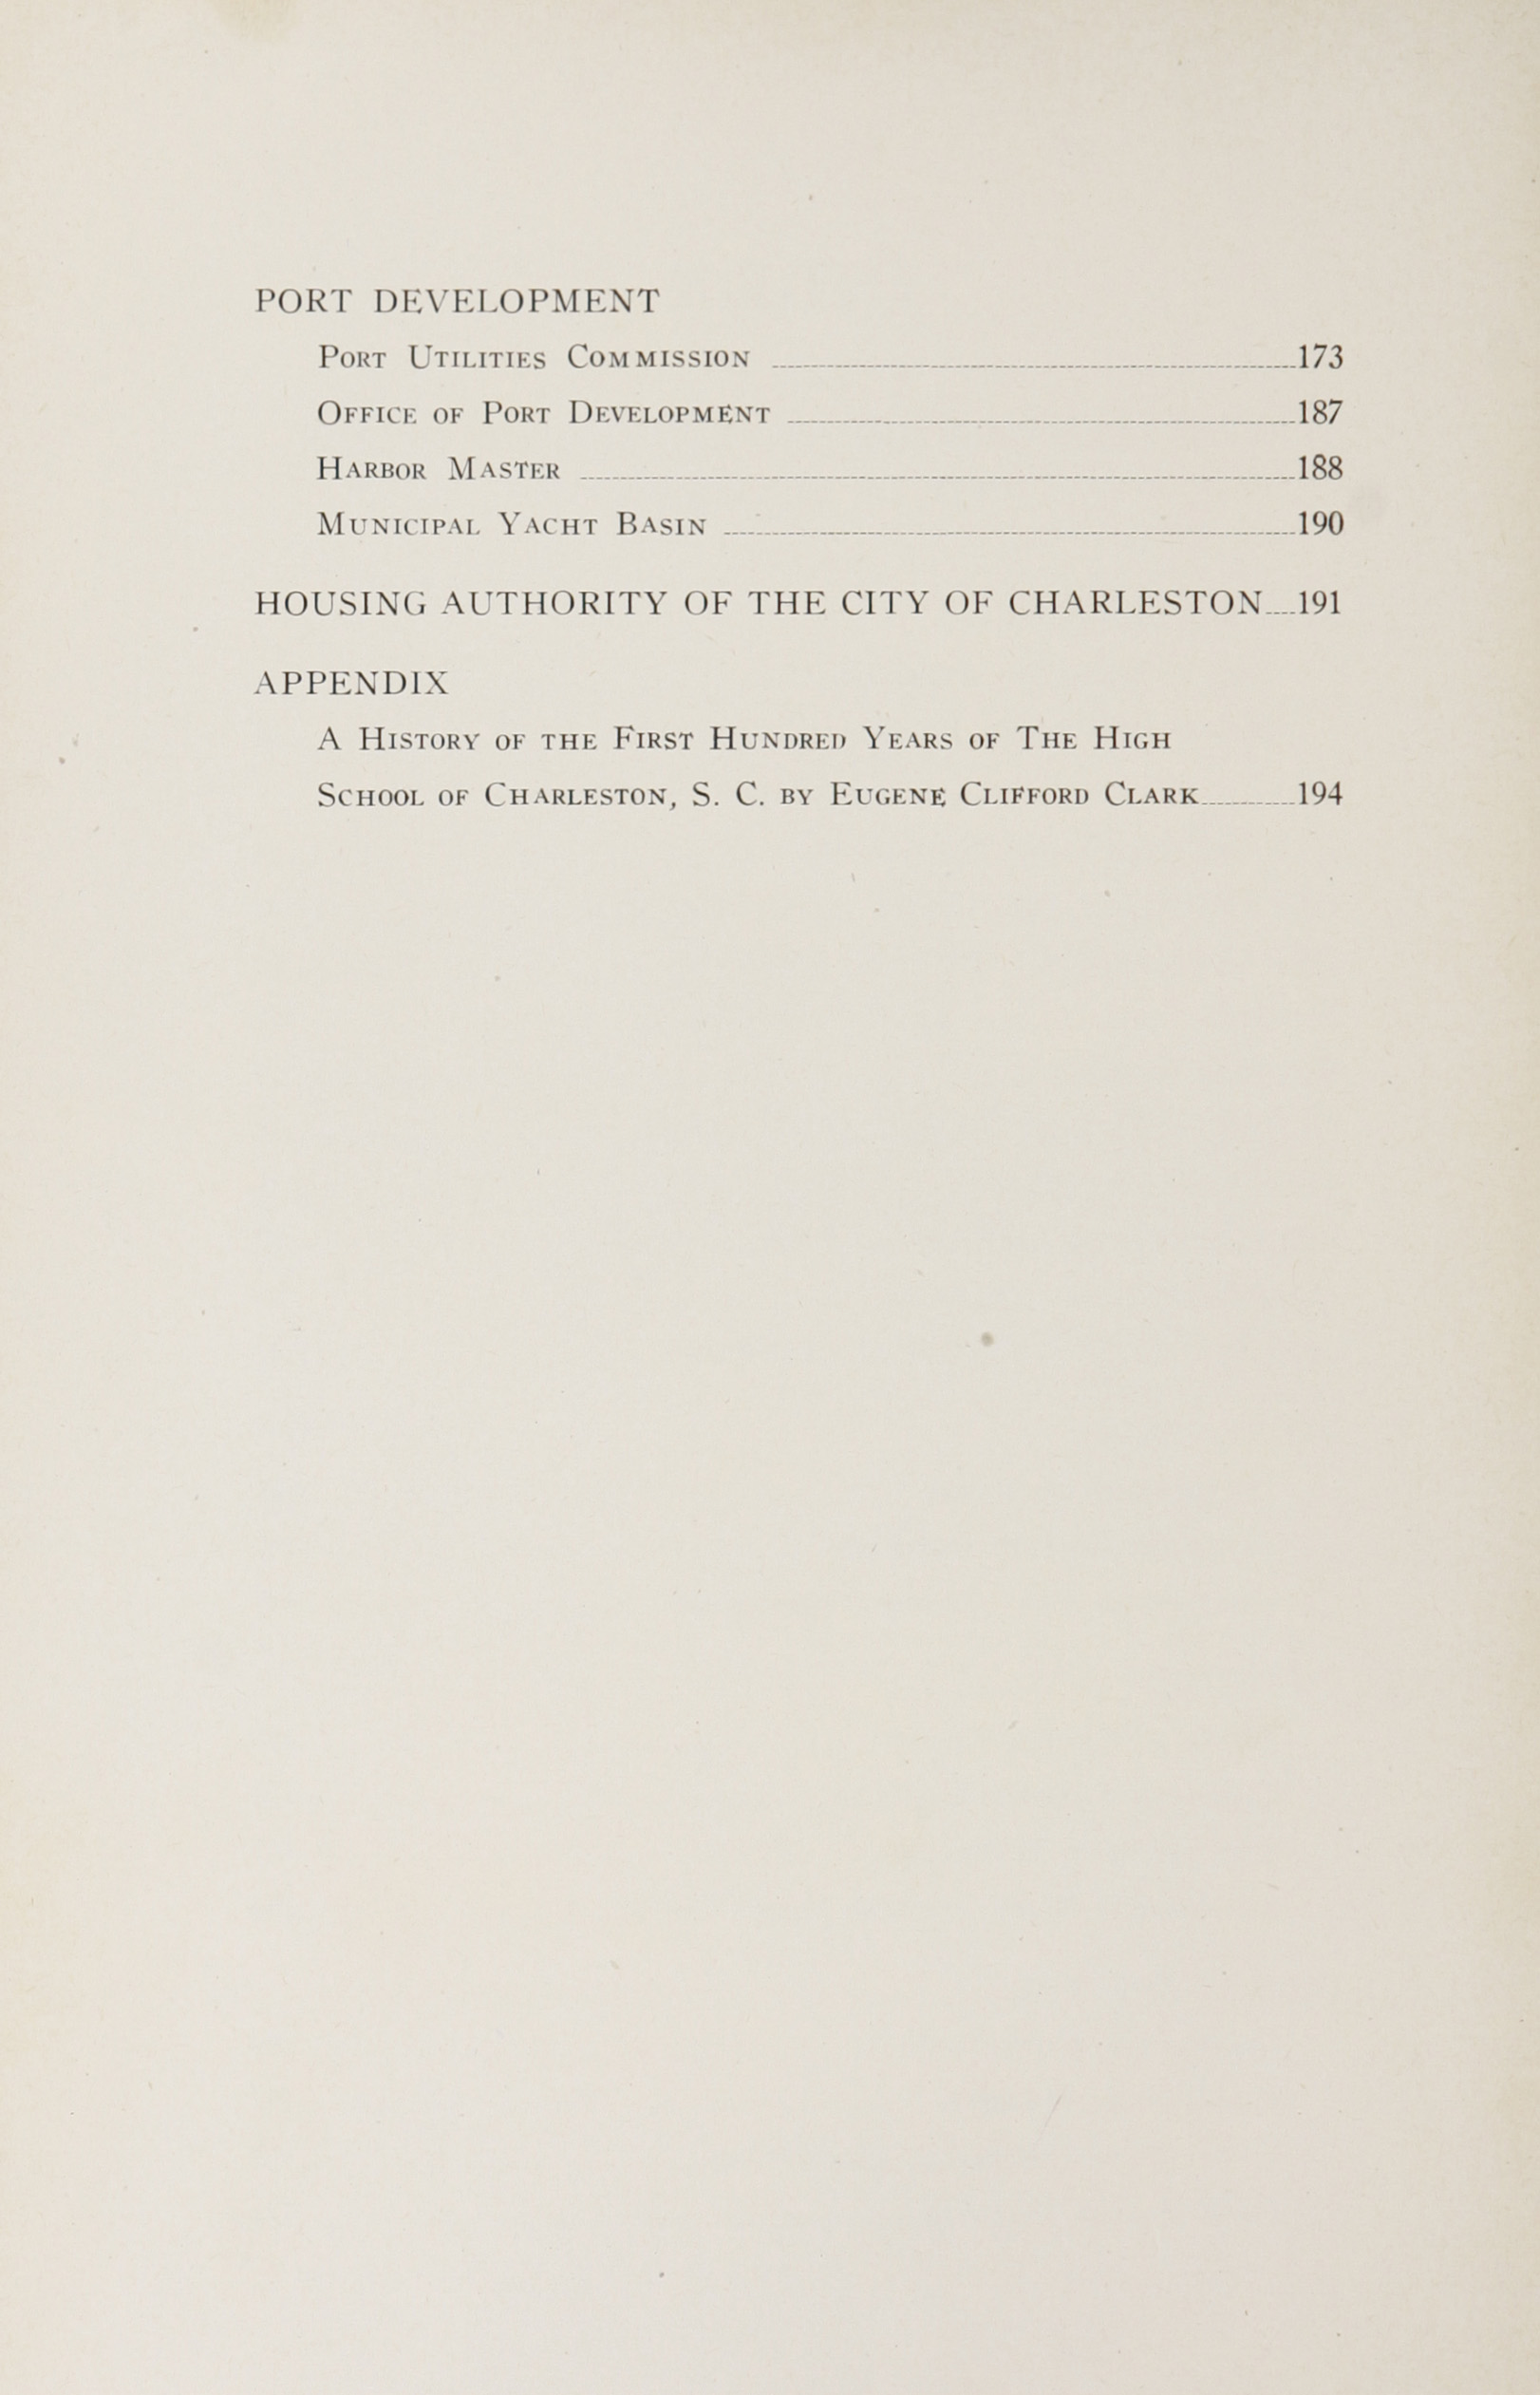 Charleston Yearbook, 1943, page 4